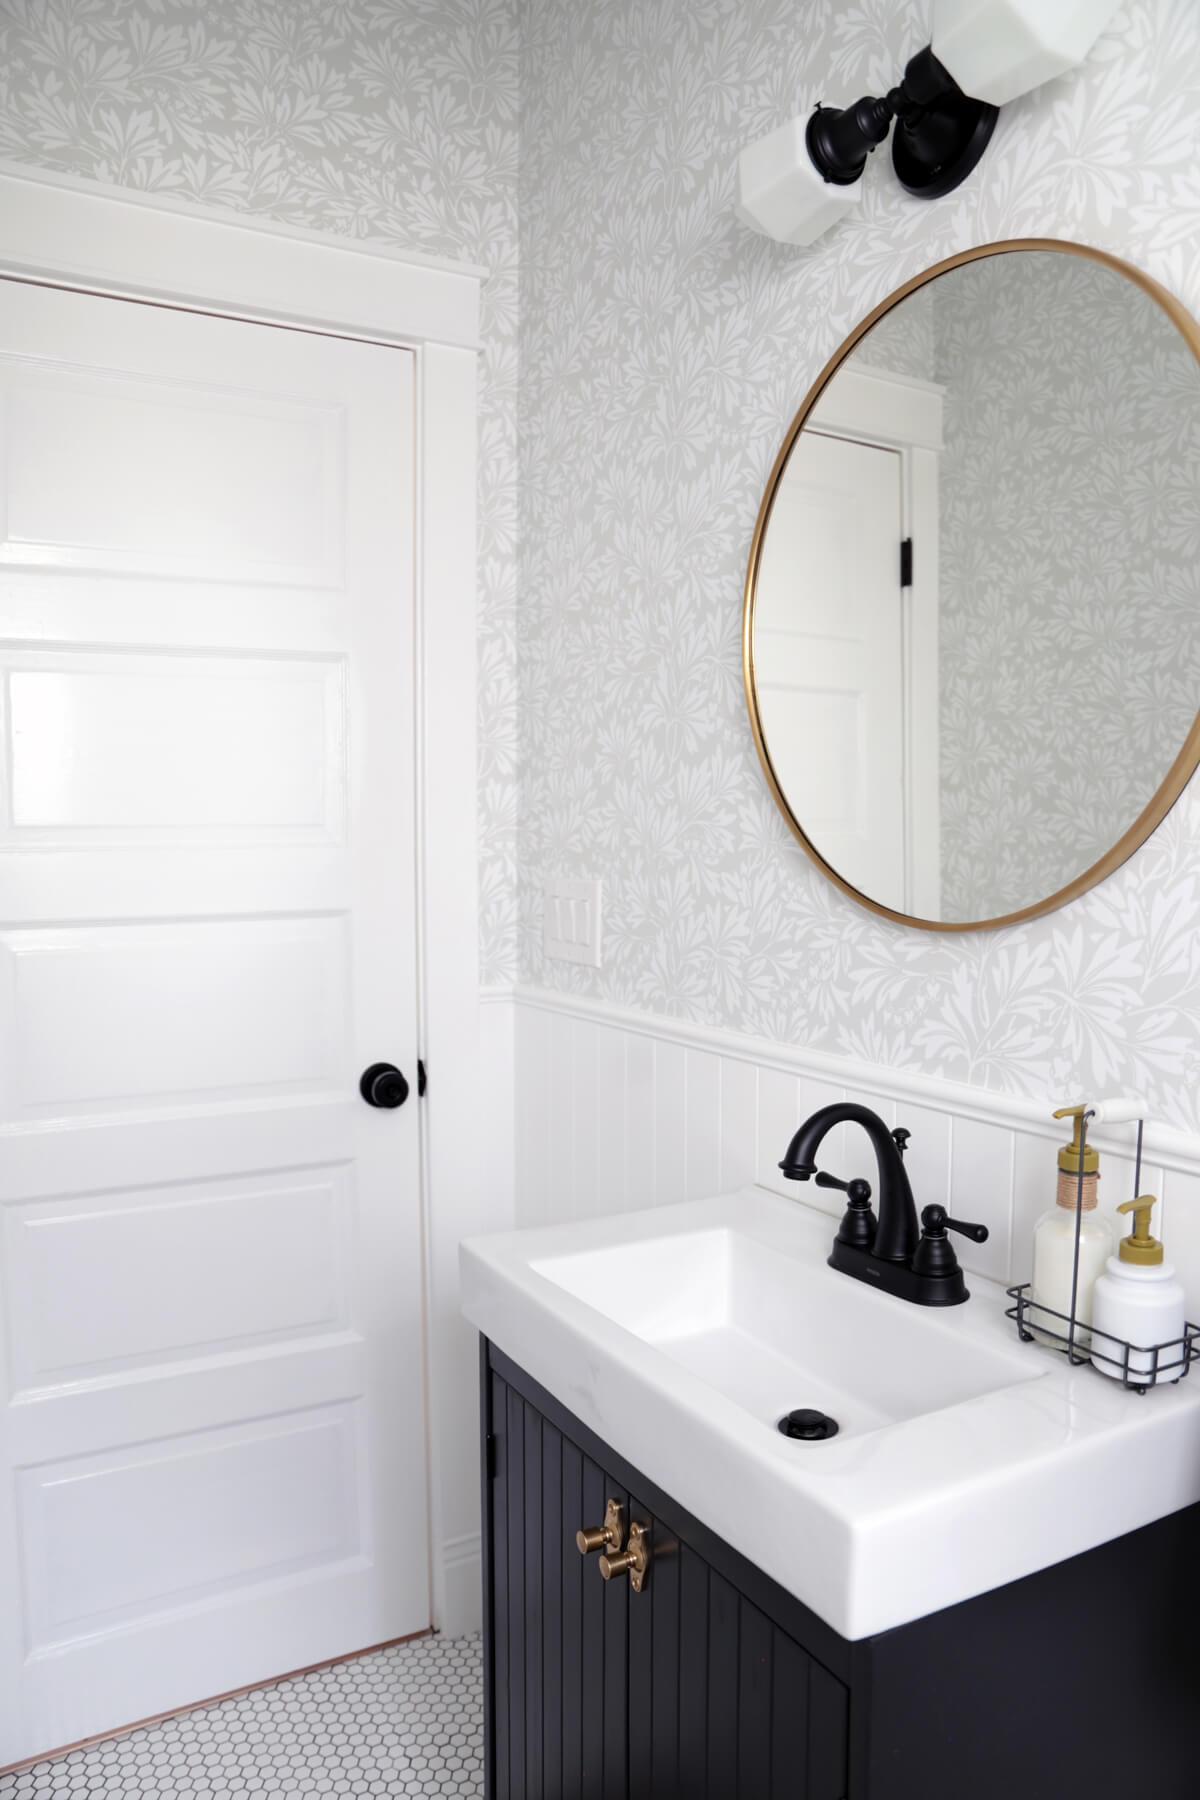 IKEA-SILVERAN-bathroom-vanity.jpg